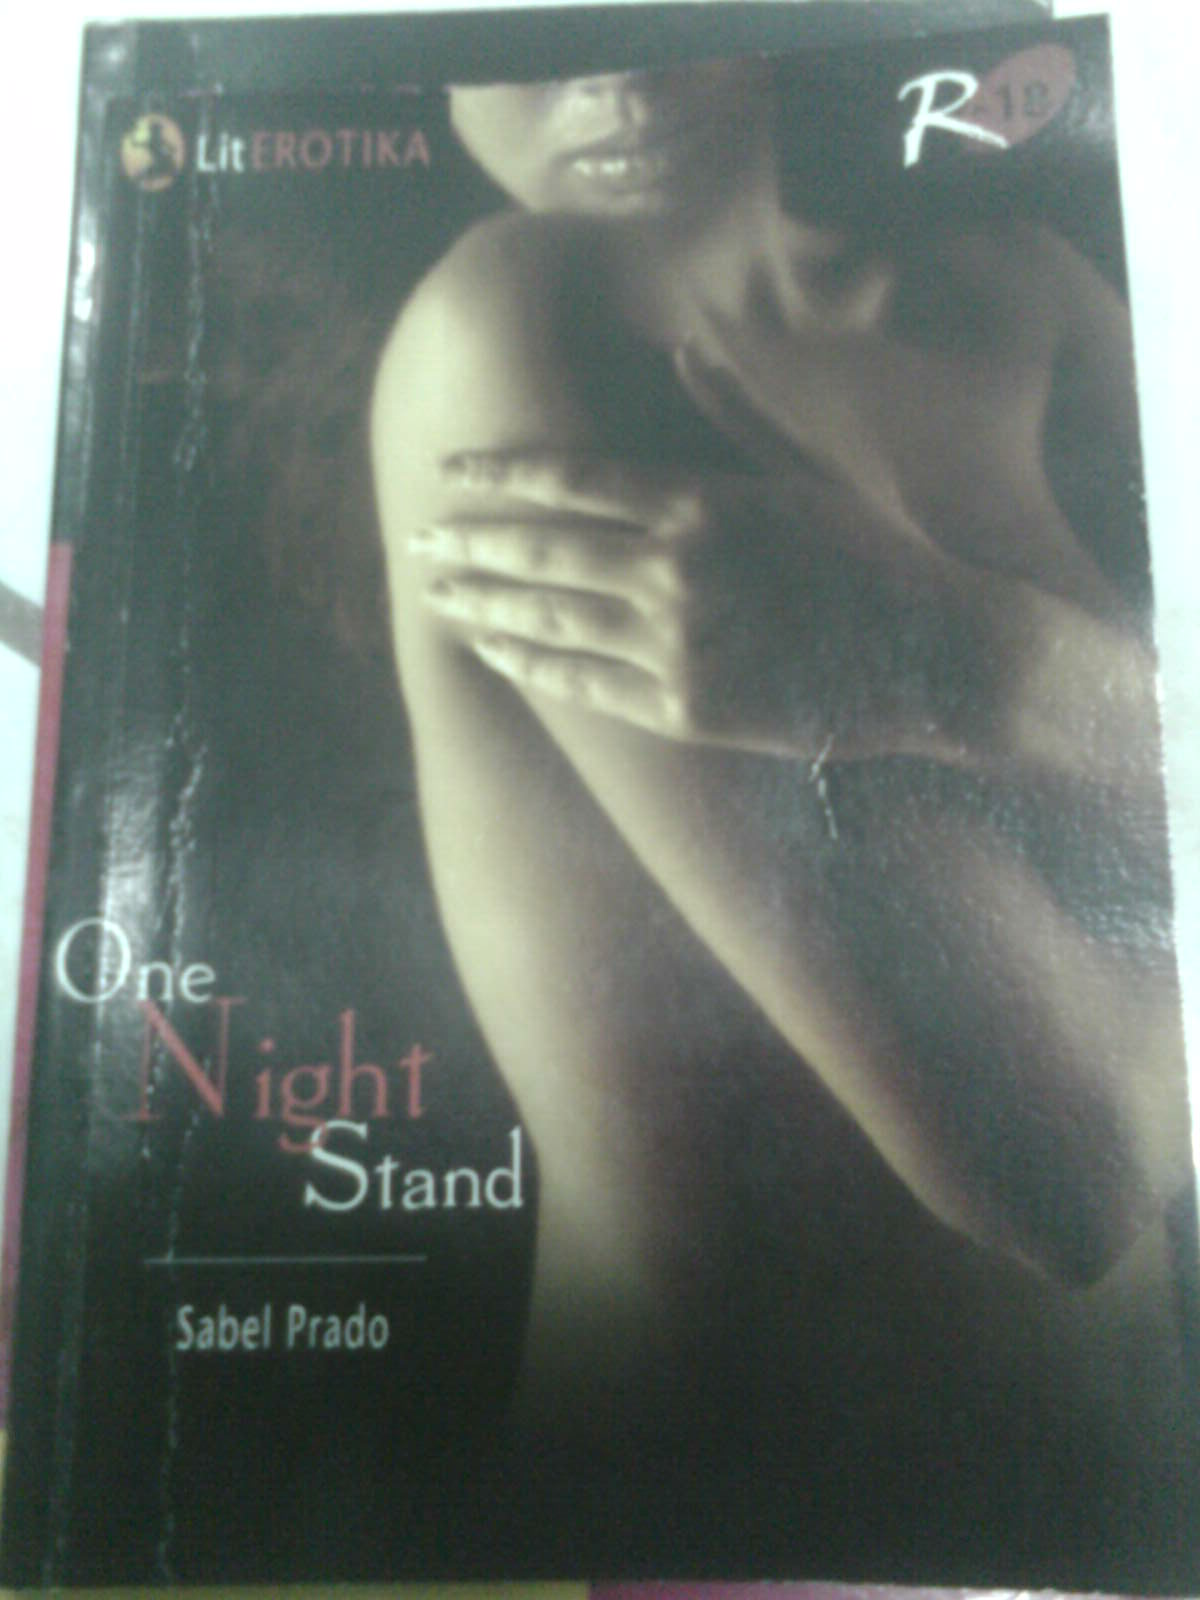 Dating One-night Stand Bitch